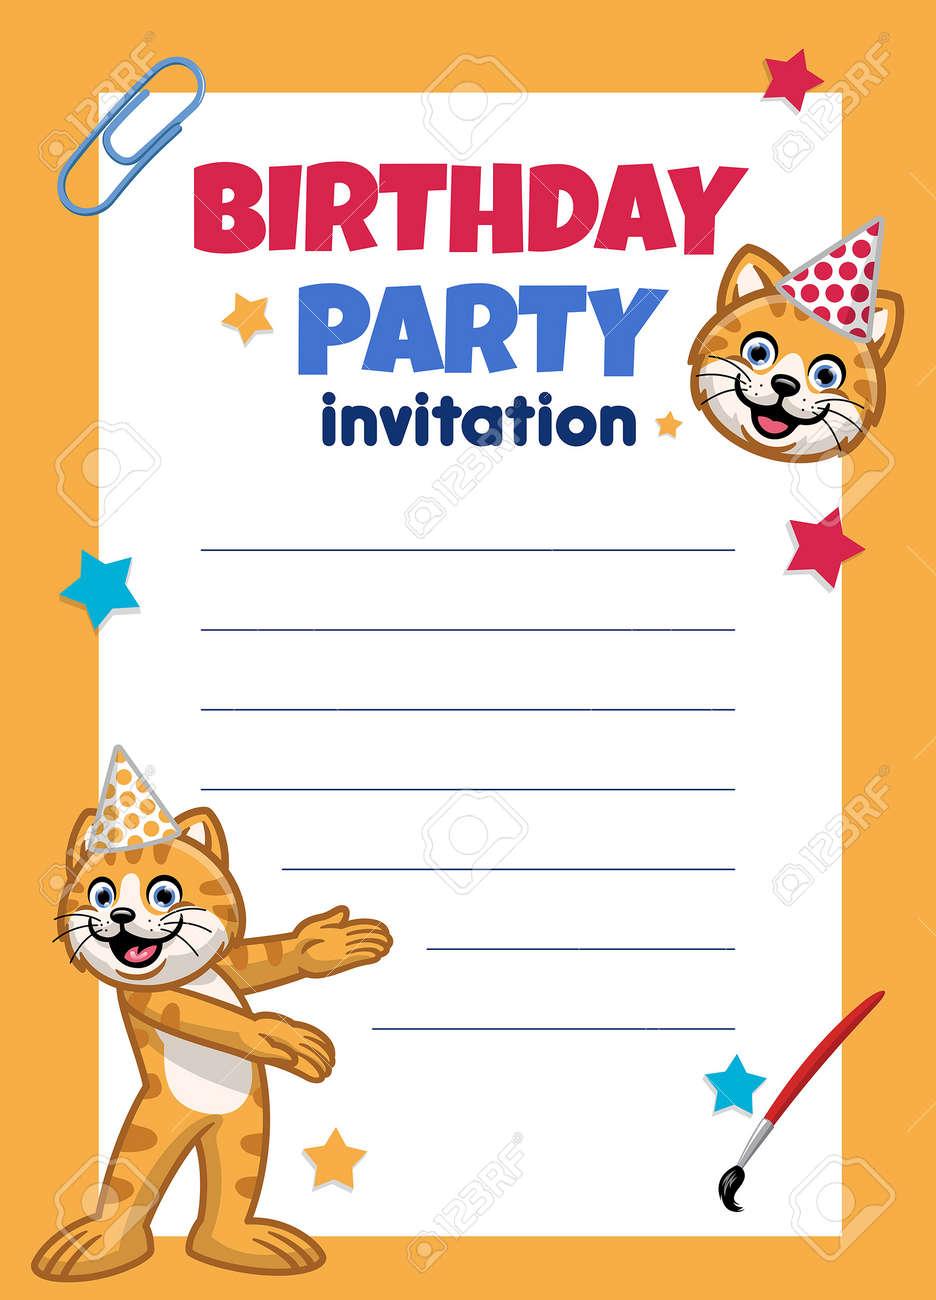 vector of birthday invitation design with cute cat - 170004759